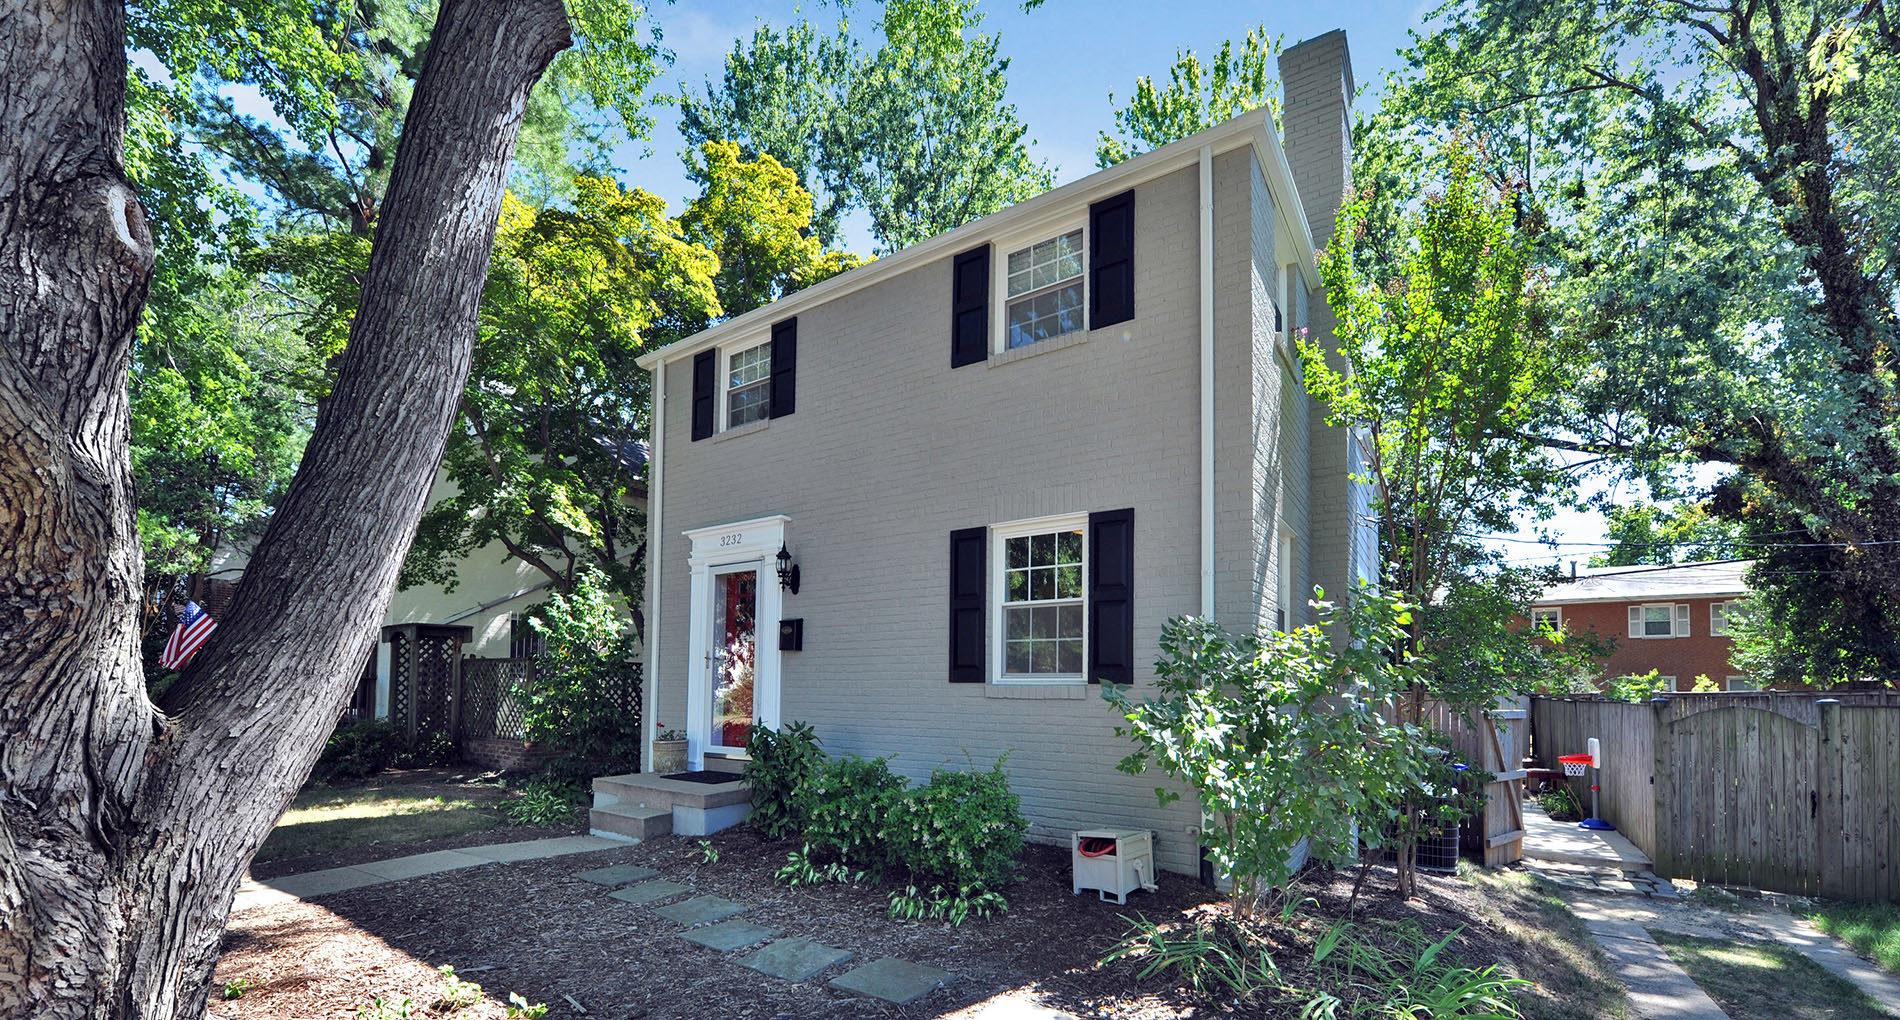 Home Remodel Arlington Haysdasz Slider